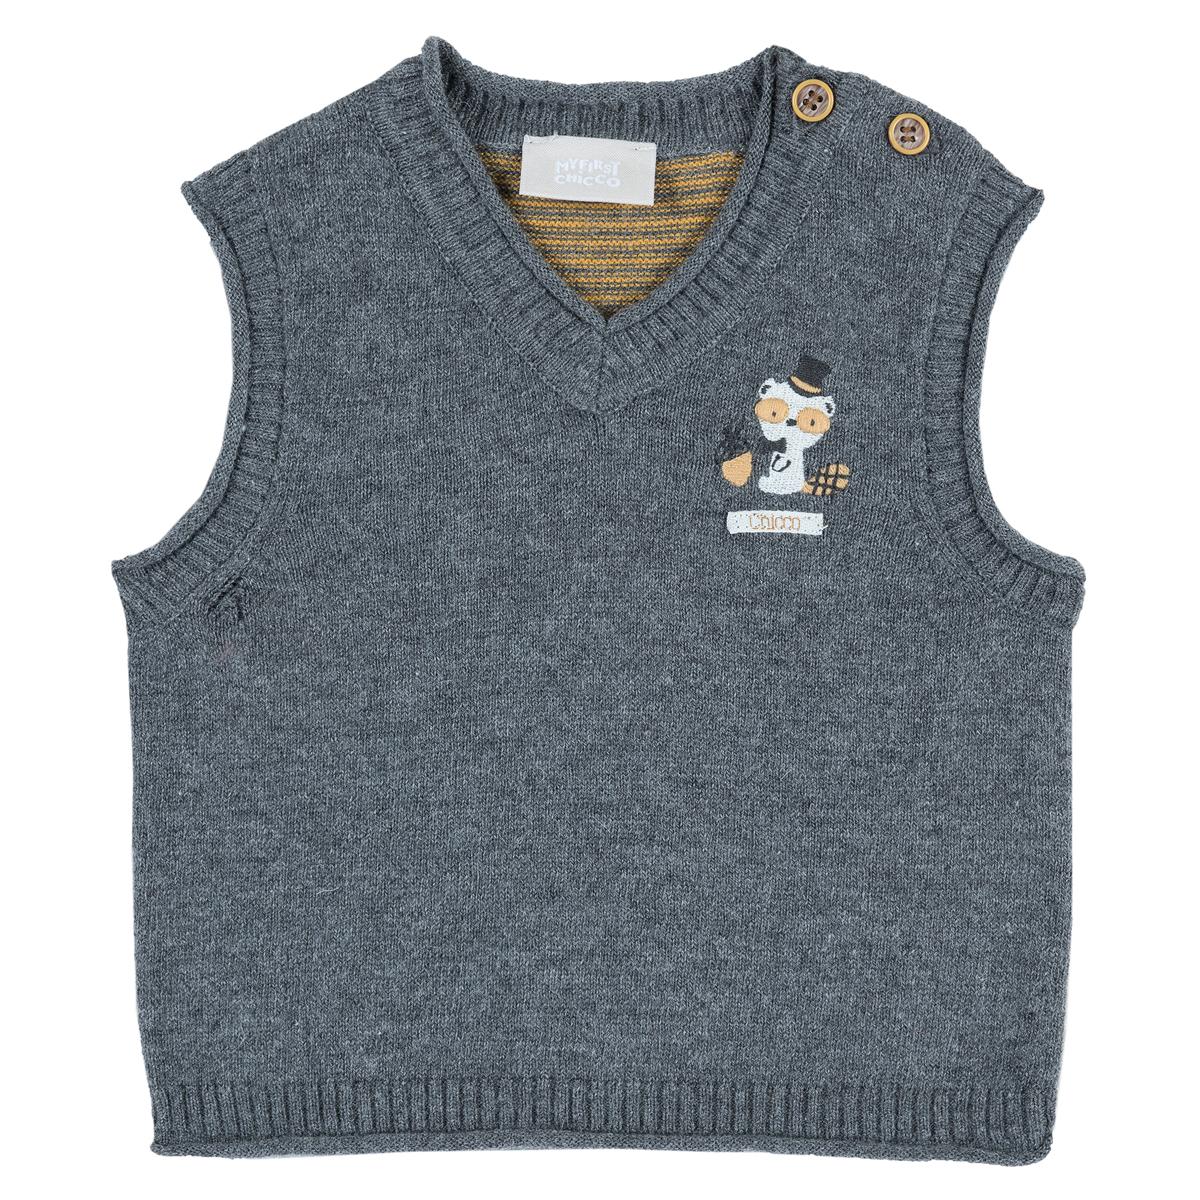 Vesta copii tricotata Chicco, gri inchis, 96893 din categoria Veste copii